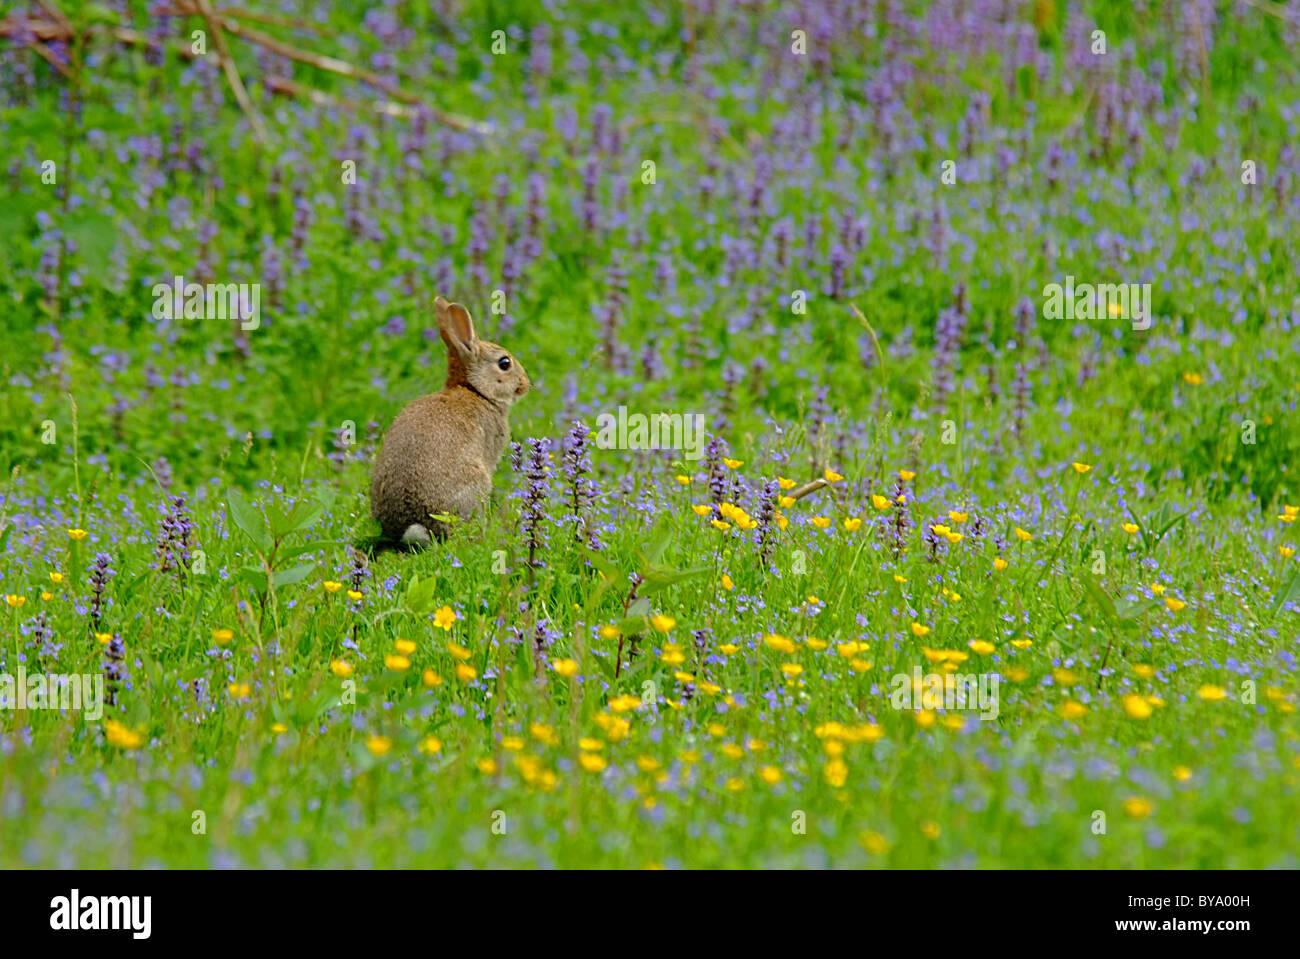 Rabbit in meadow - Stock Image